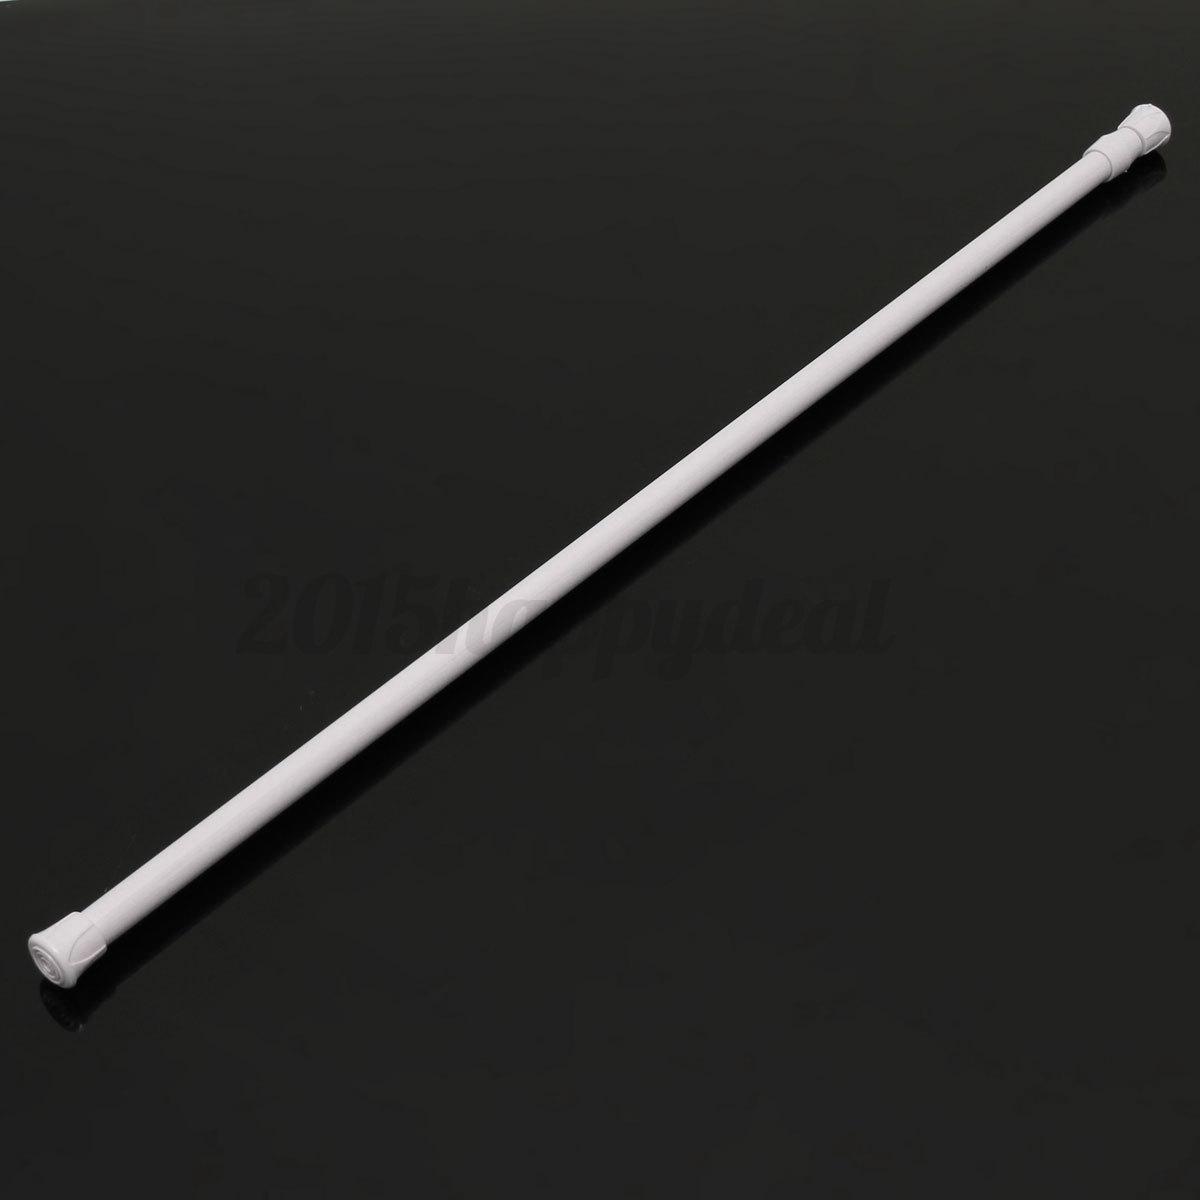 curtain rail pole spring extendable telescopic shower bath window tension rod ebay. Black Bedroom Furniture Sets. Home Design Ideas